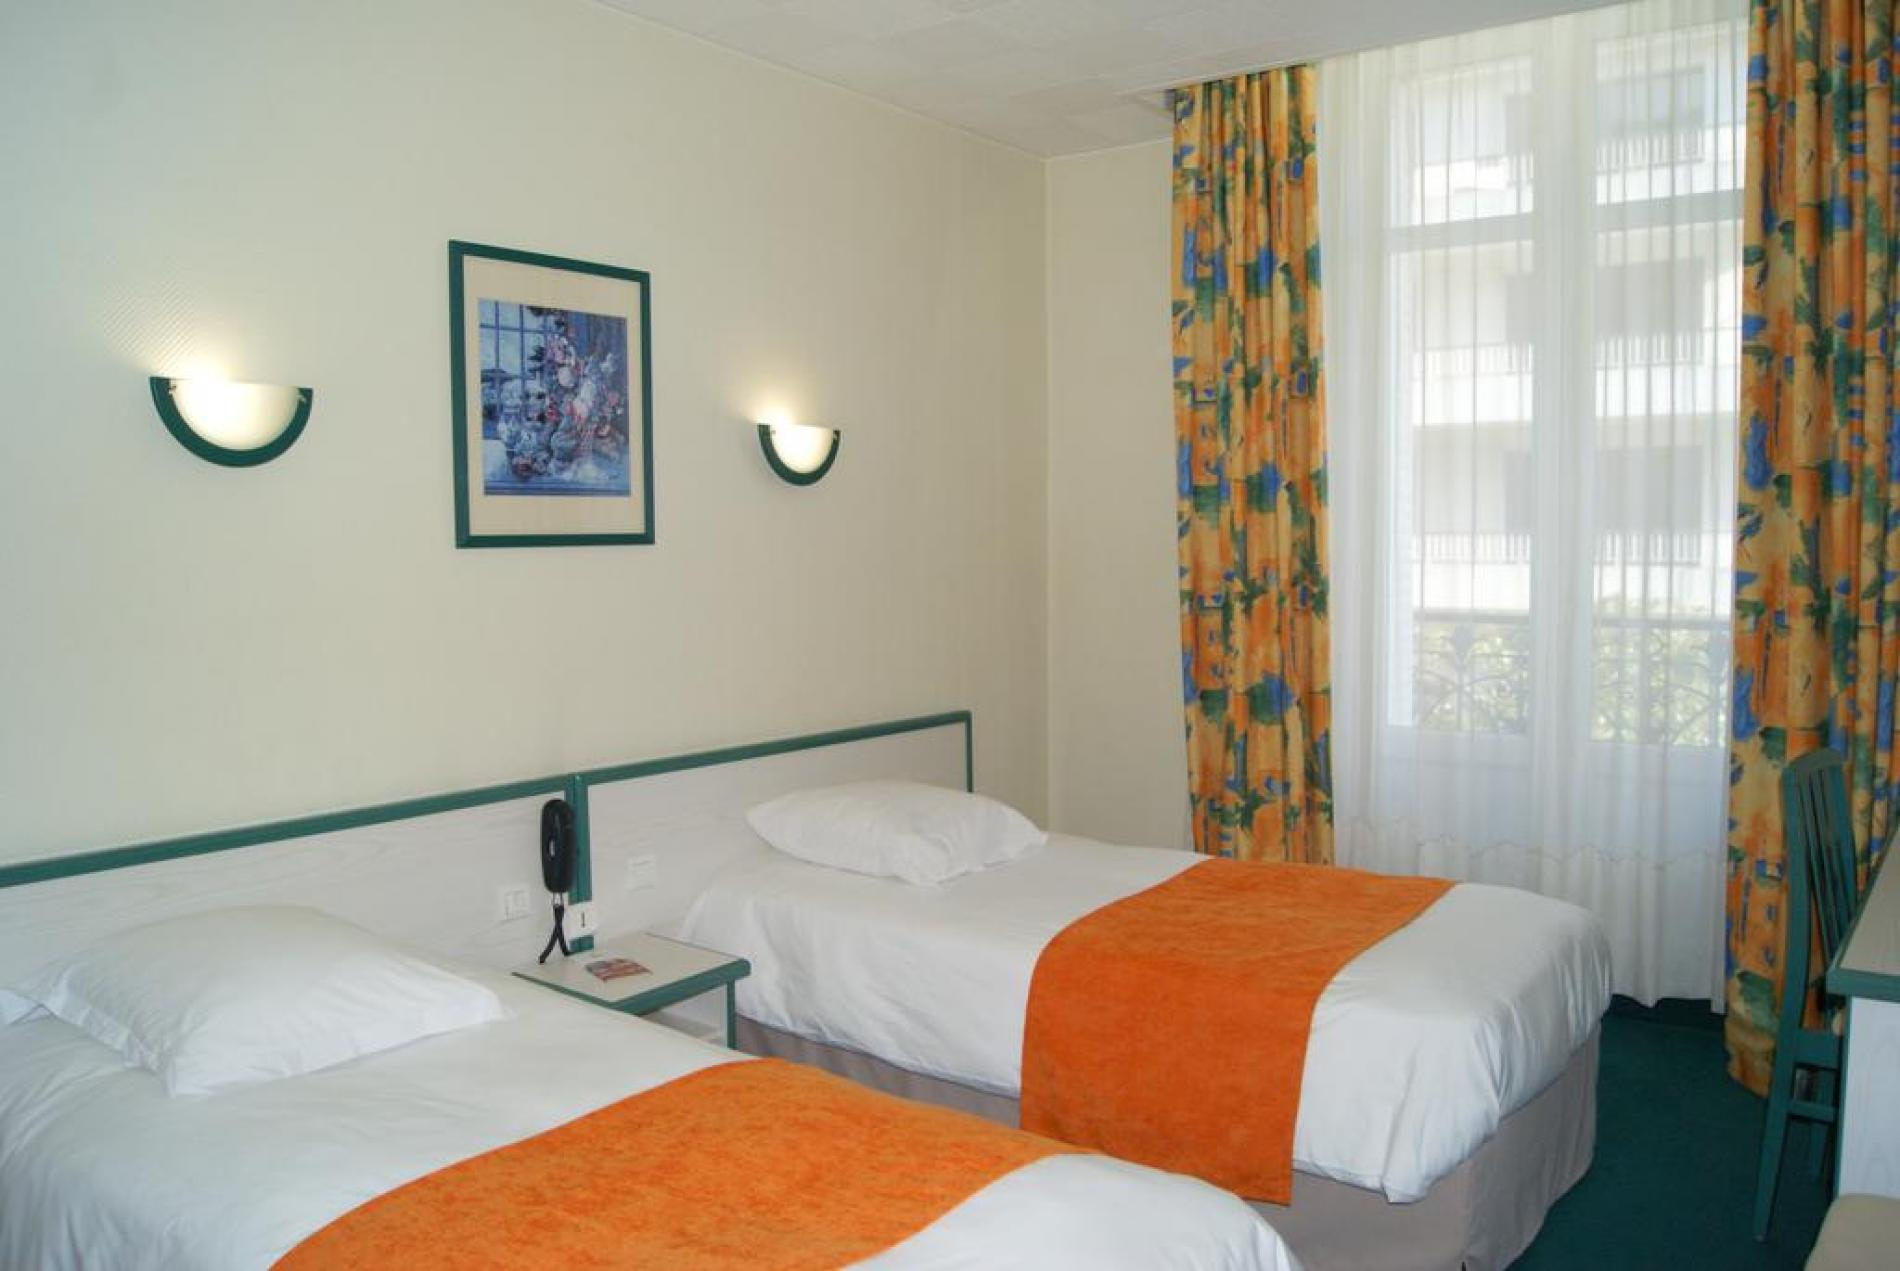 tarifs et offres de l 39 h tel l 39 univers angers chambre standard 2 lits. Black Bedroom Furniture Sets. Home Design Ideas